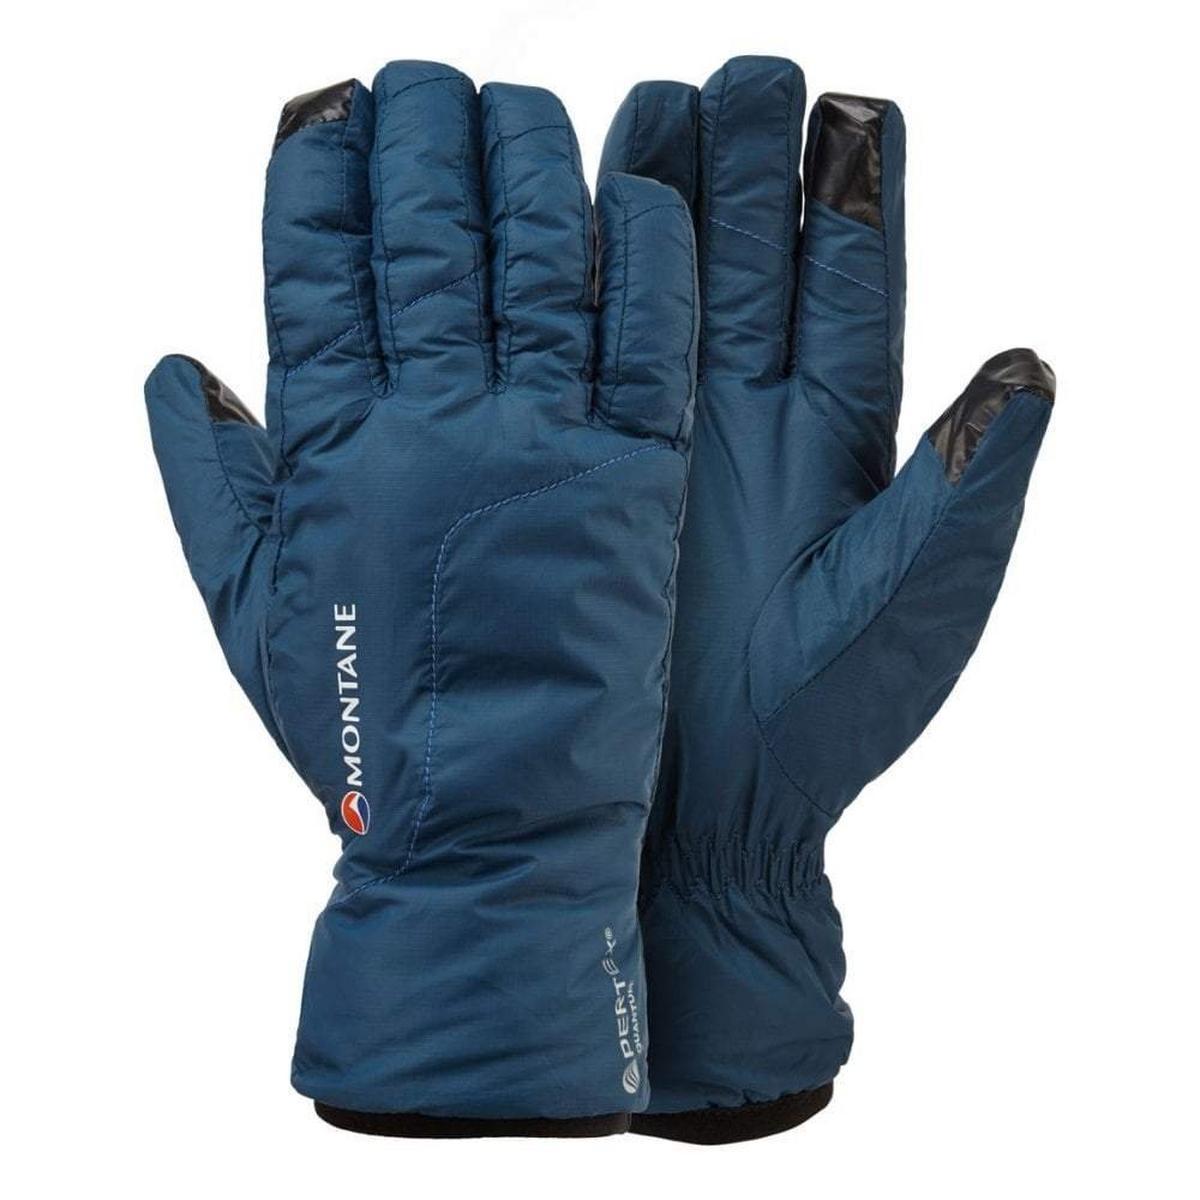 Montane Women's Montane Prism Glove - Navy